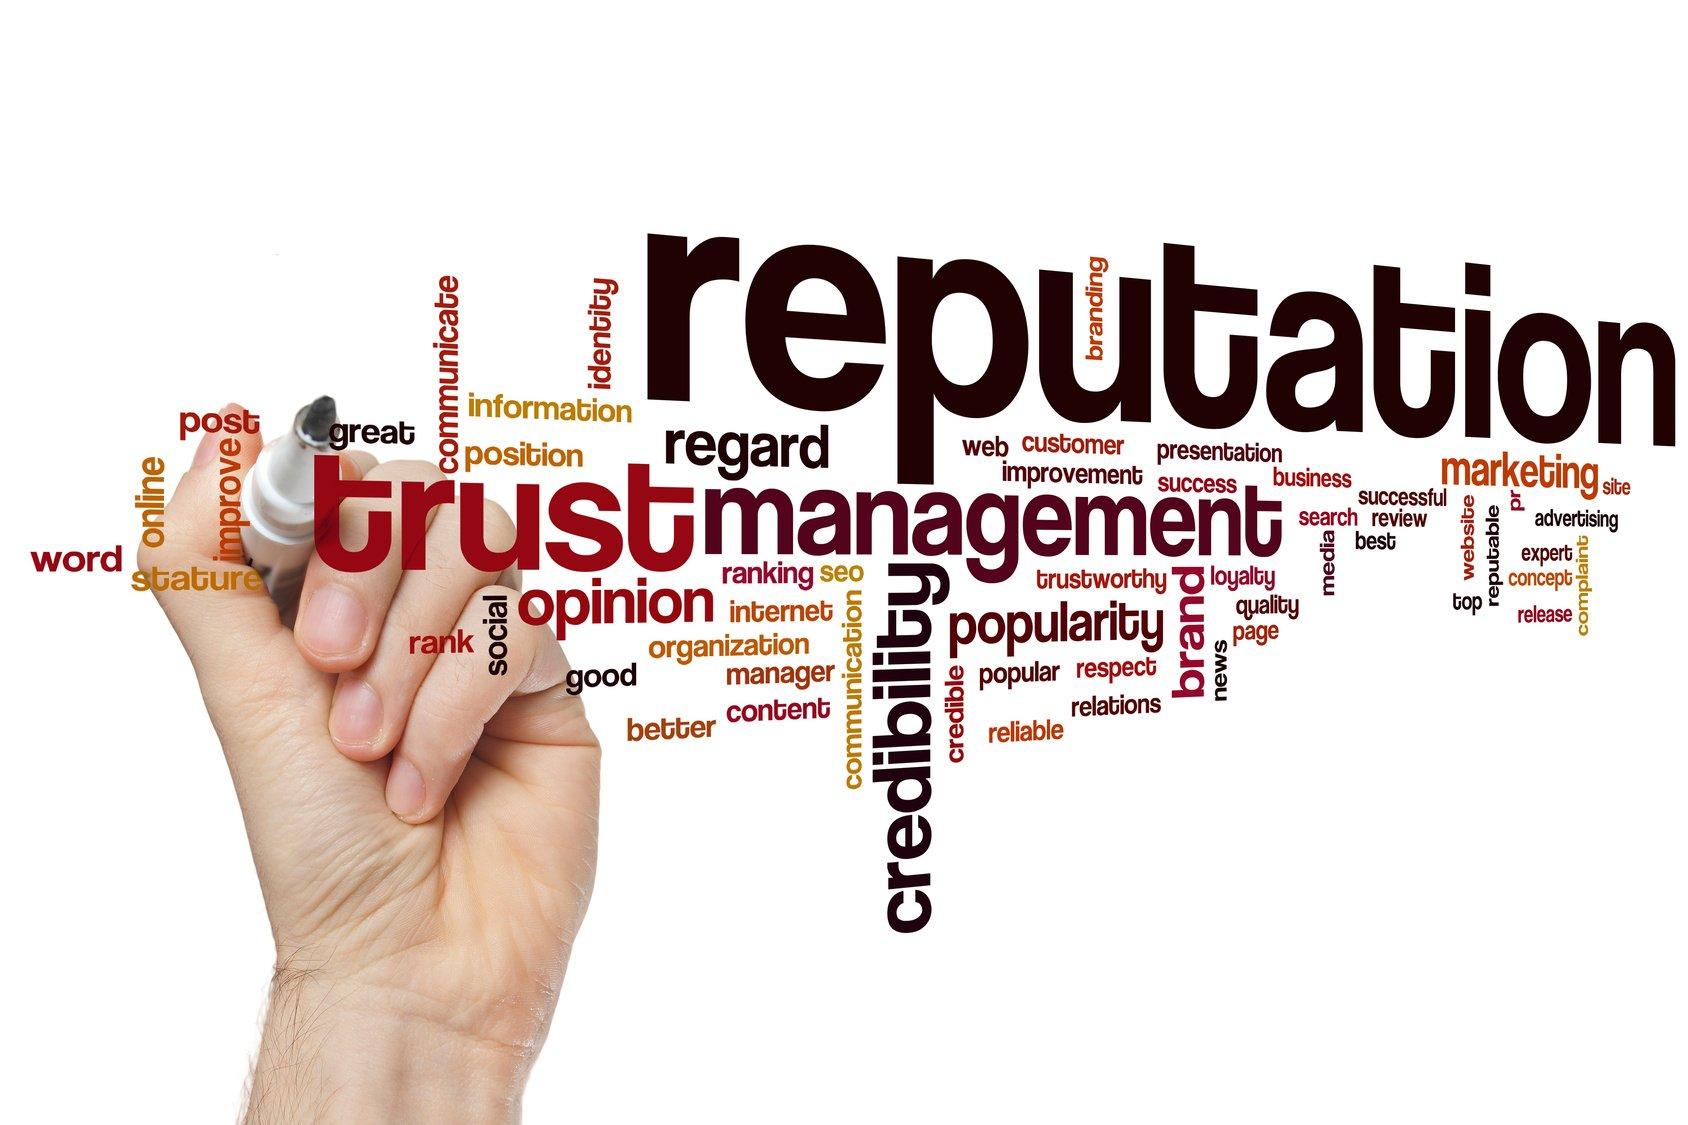 social media and reputation management